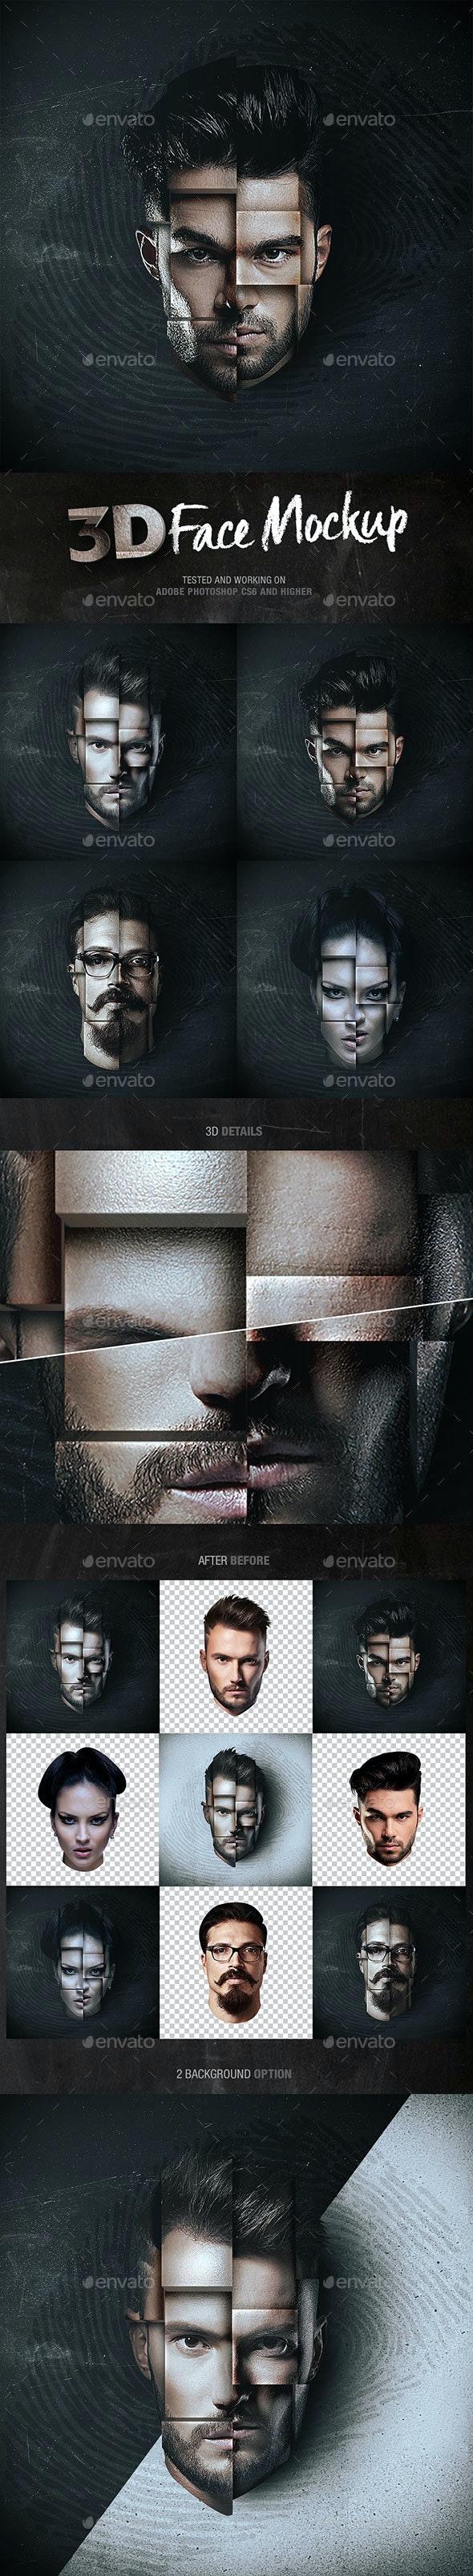 3D Face Mockup - Miscellaneous Photo Templates